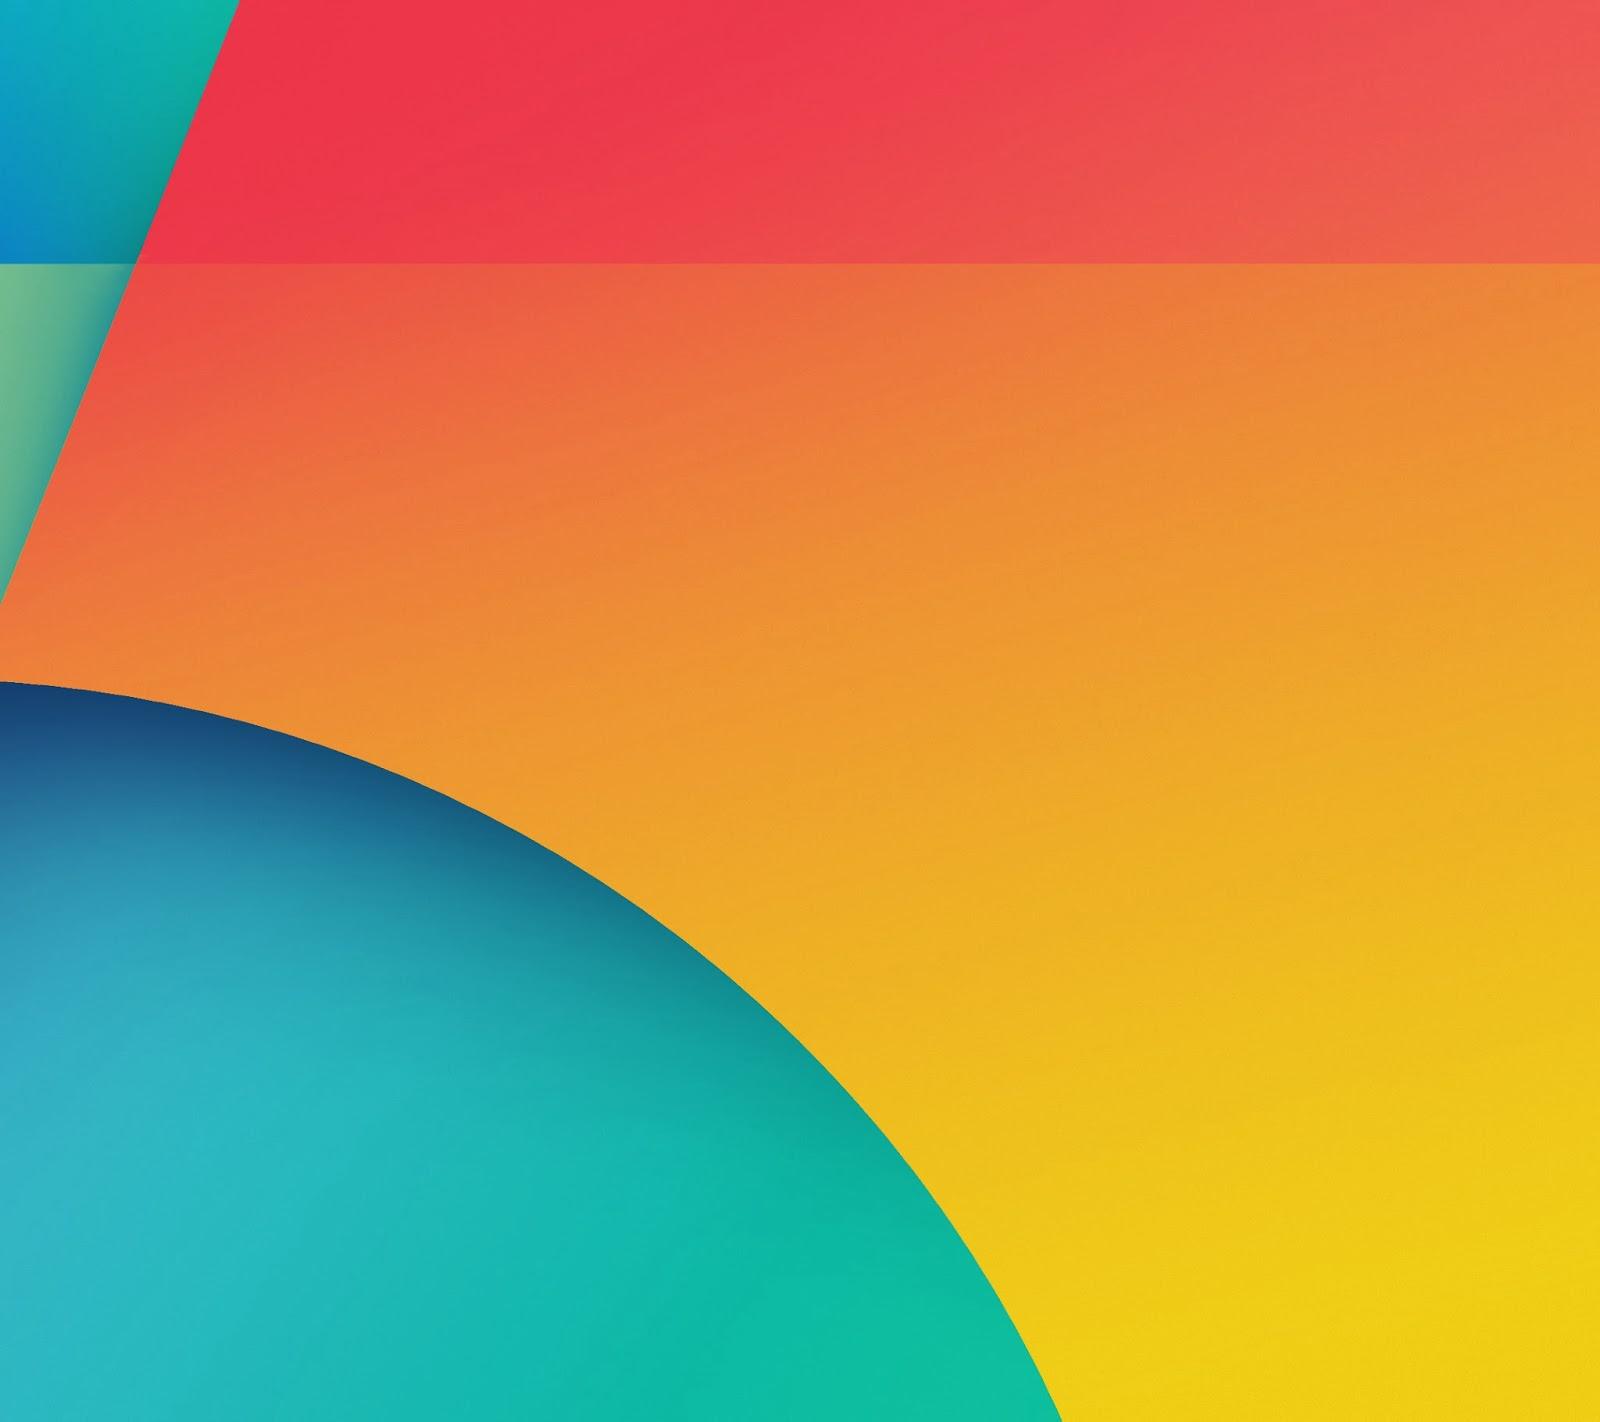 Android Kitkat Wallpaper for mobile